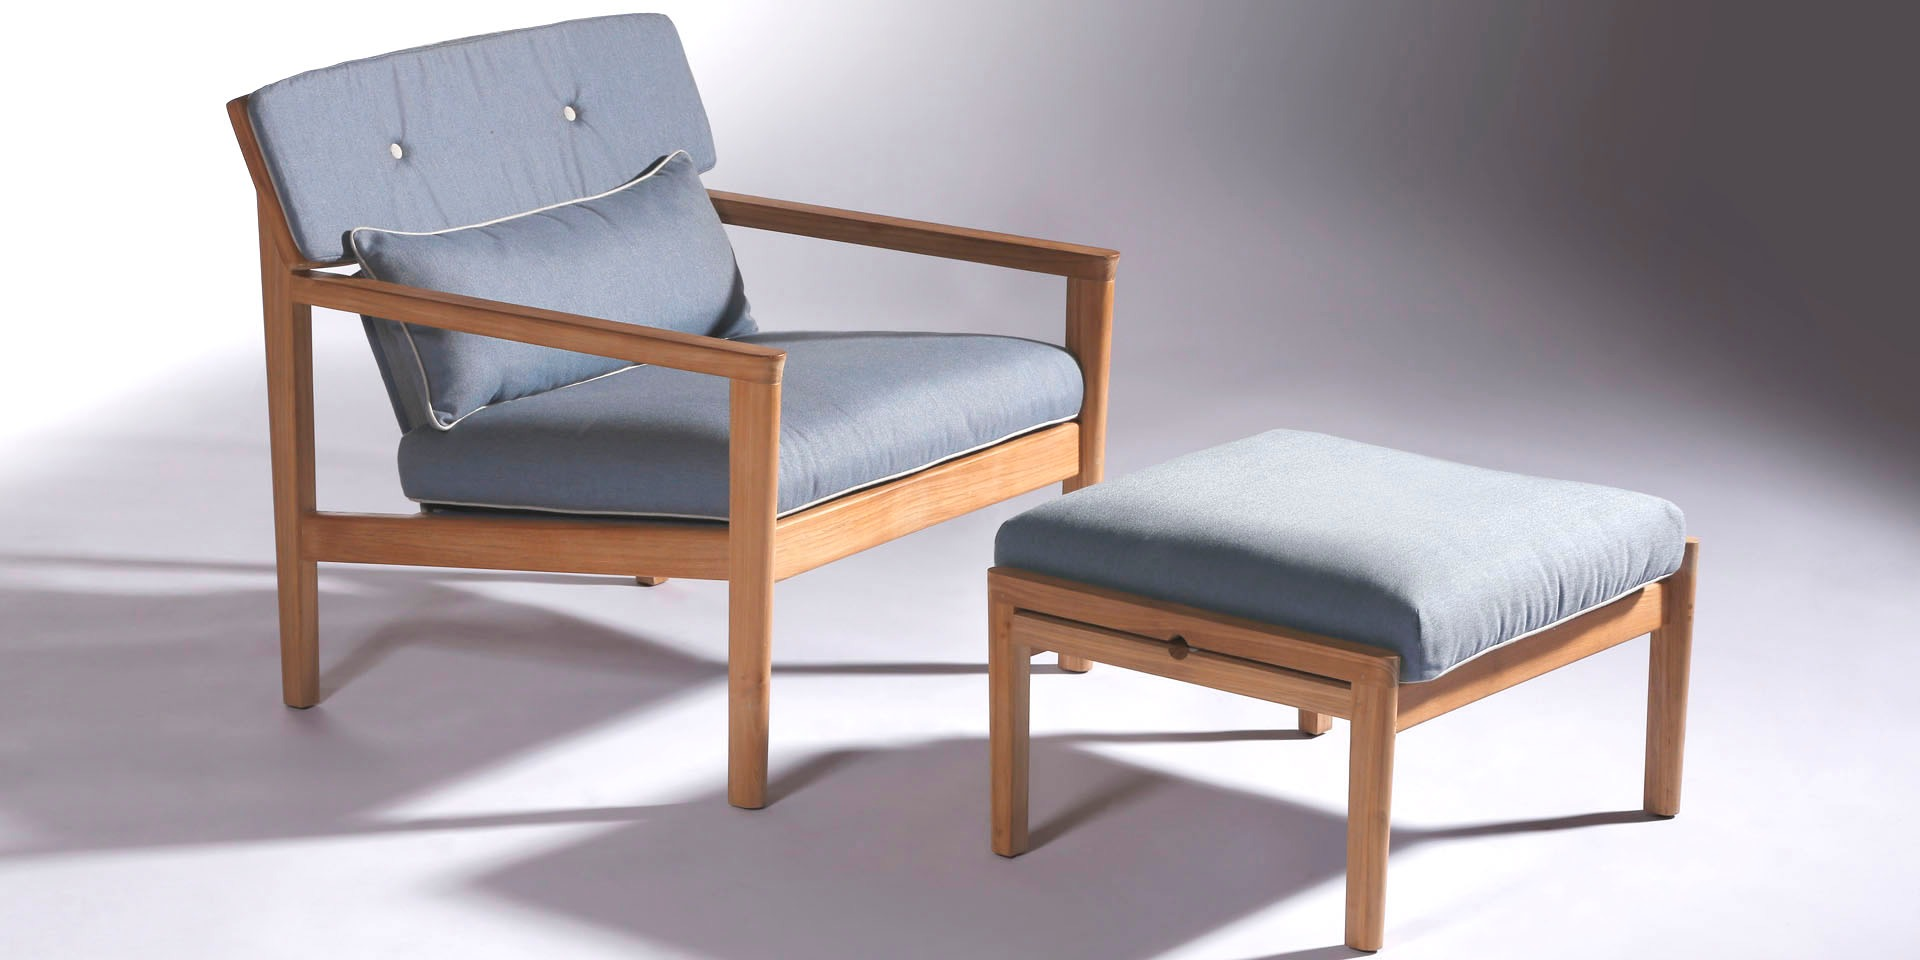 Barlow Tyrie Atom Lounge Chair and Ottoman